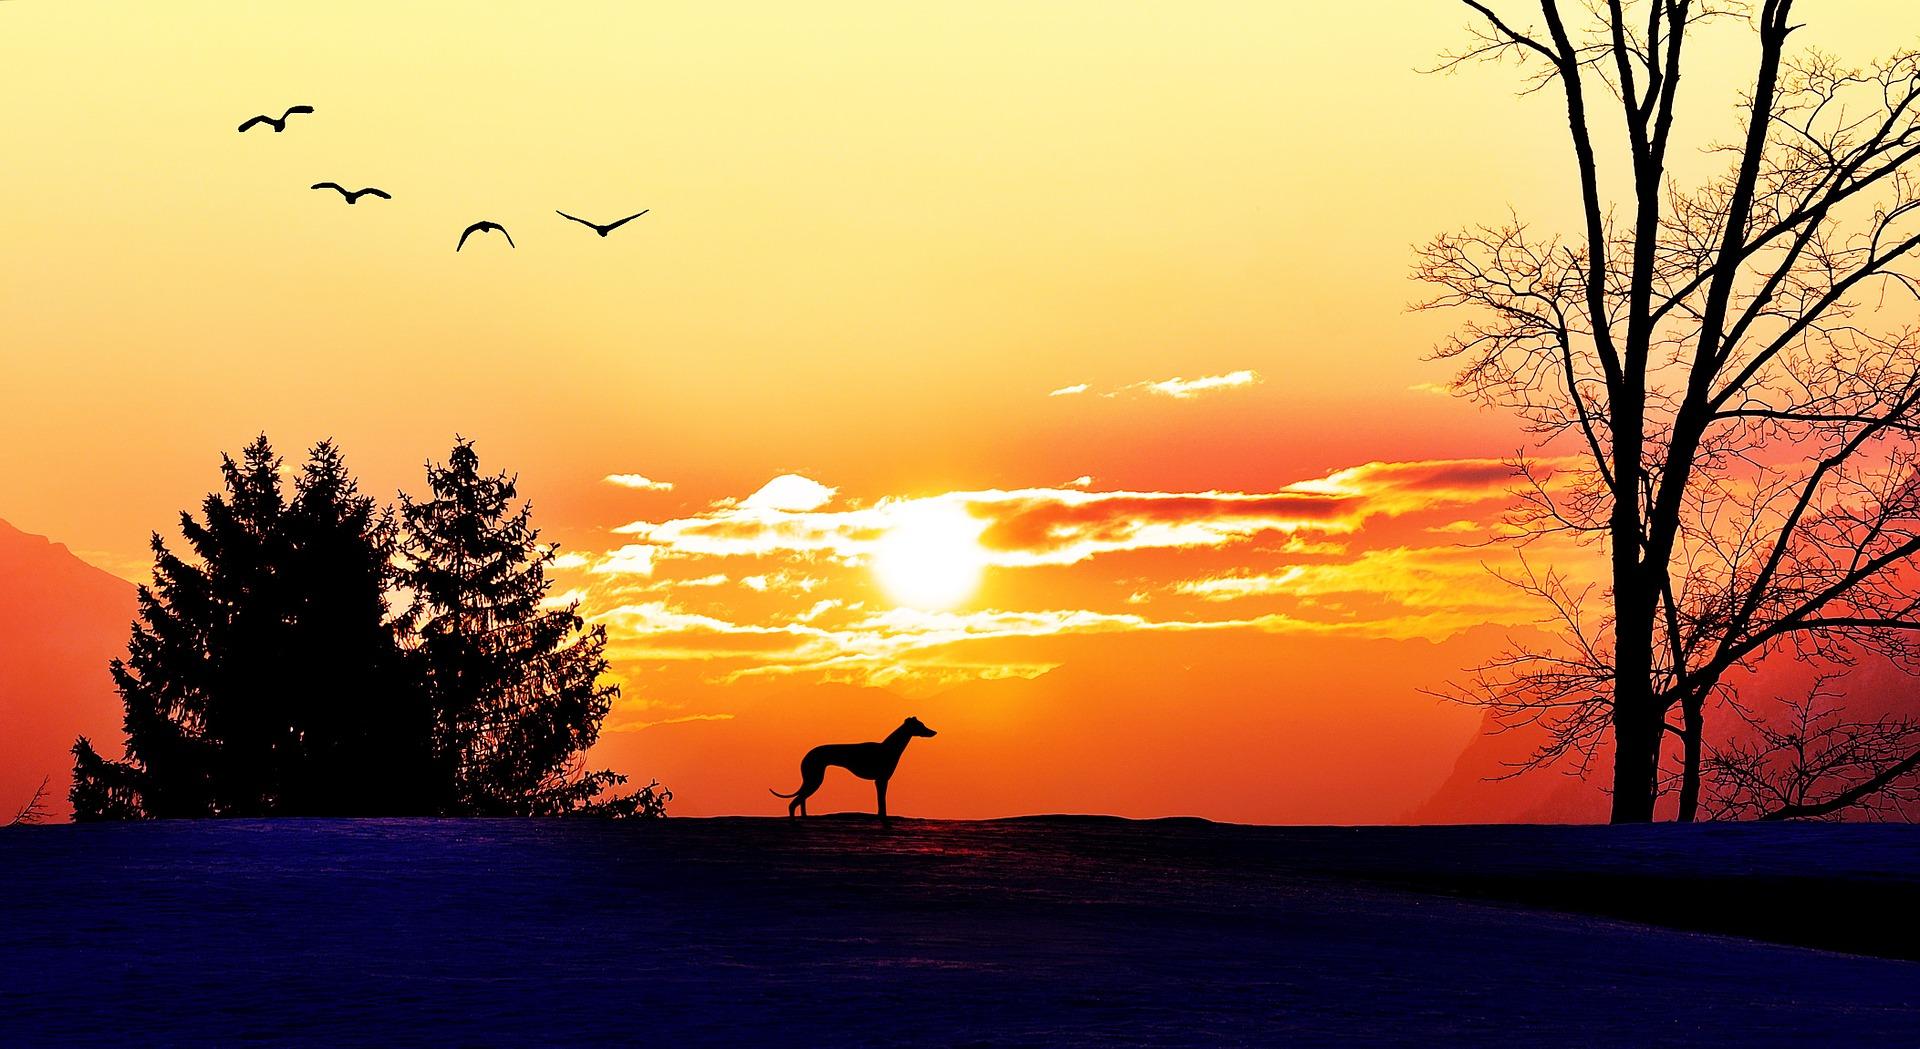 dog landscape sunset